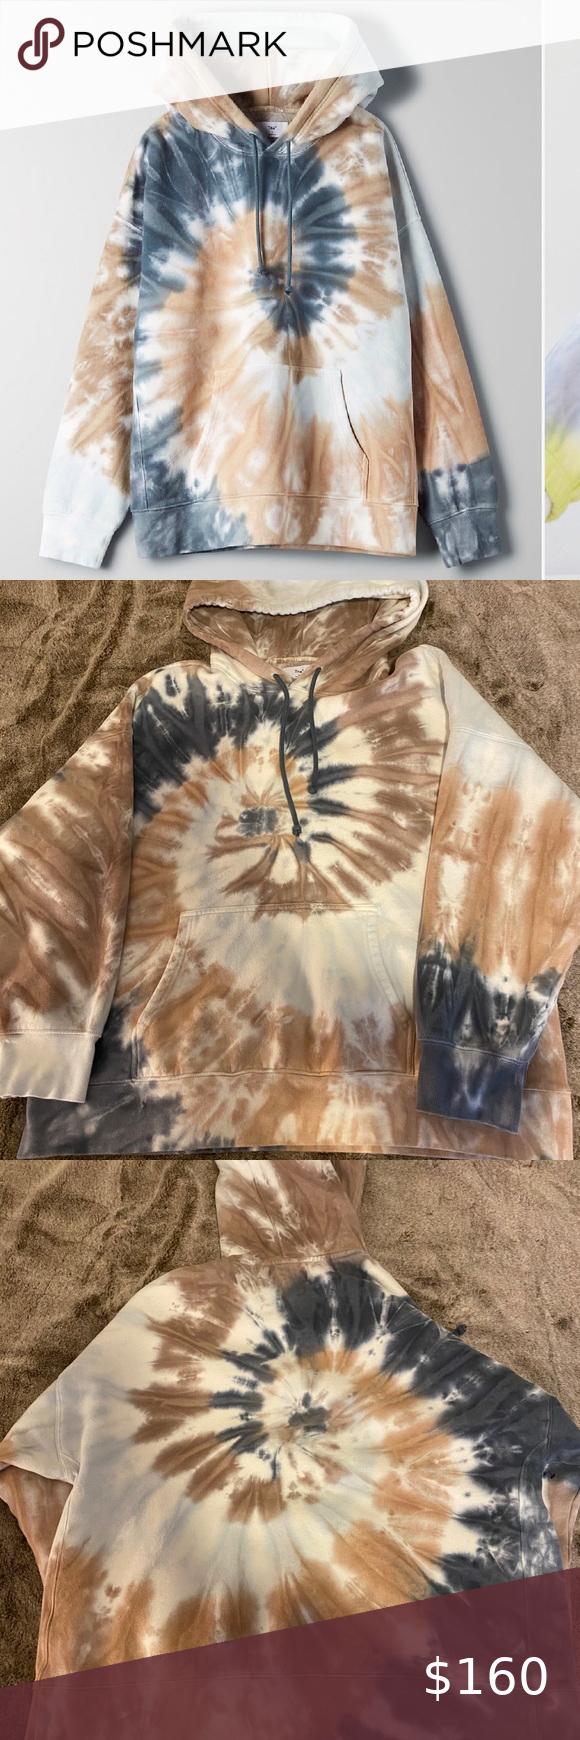 Bundle Aritzia Tna Tie Dye Hoodie Sweatpants Tie Dye Hoodie Tie Dye Aritzia [ 1740 x 580 Pixel ]